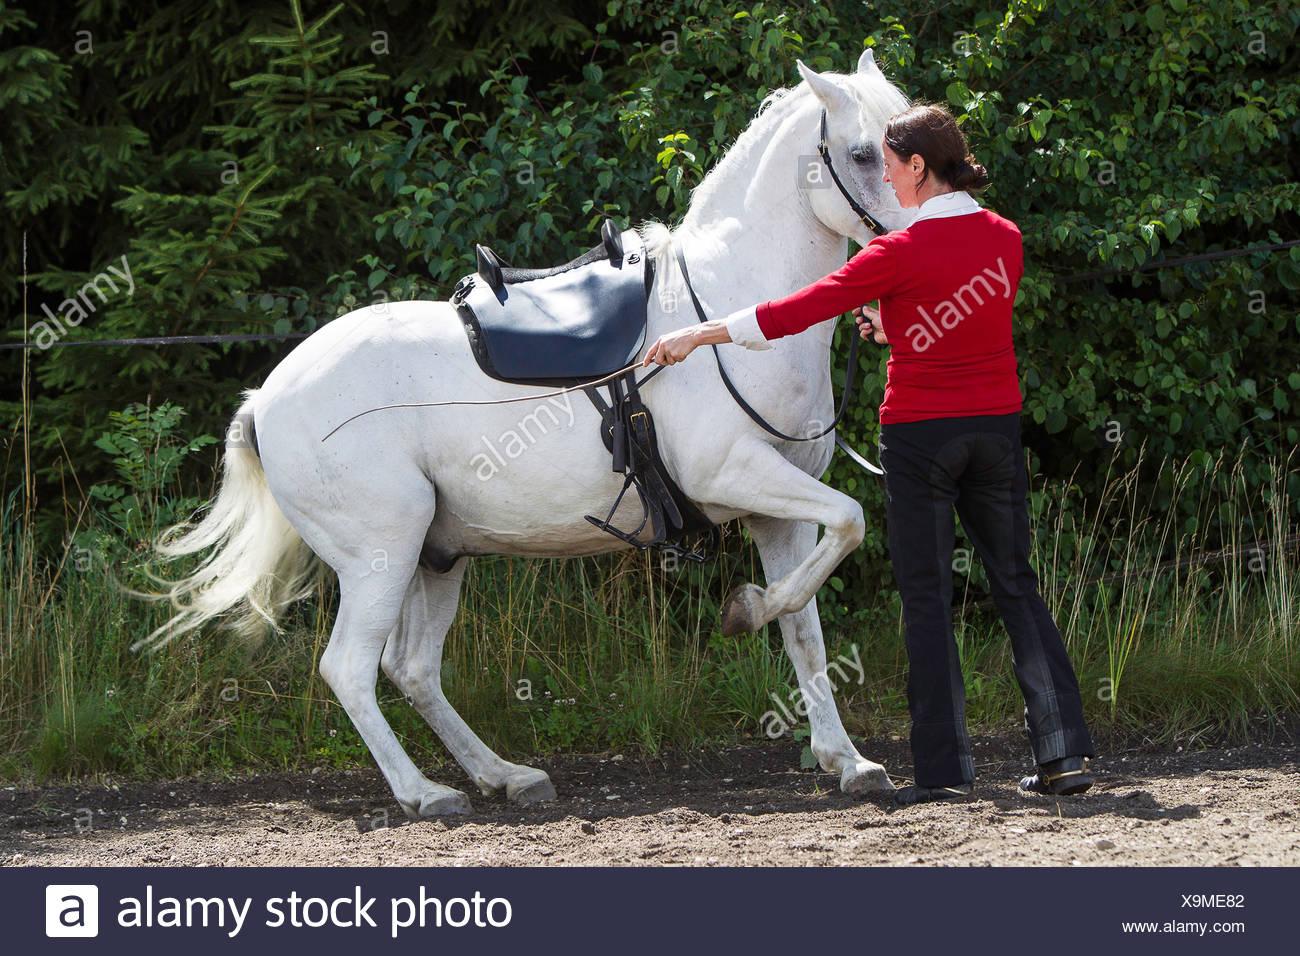 German Riding Pony Claudia Strau§ doing ground work training gray horse - Stock Image